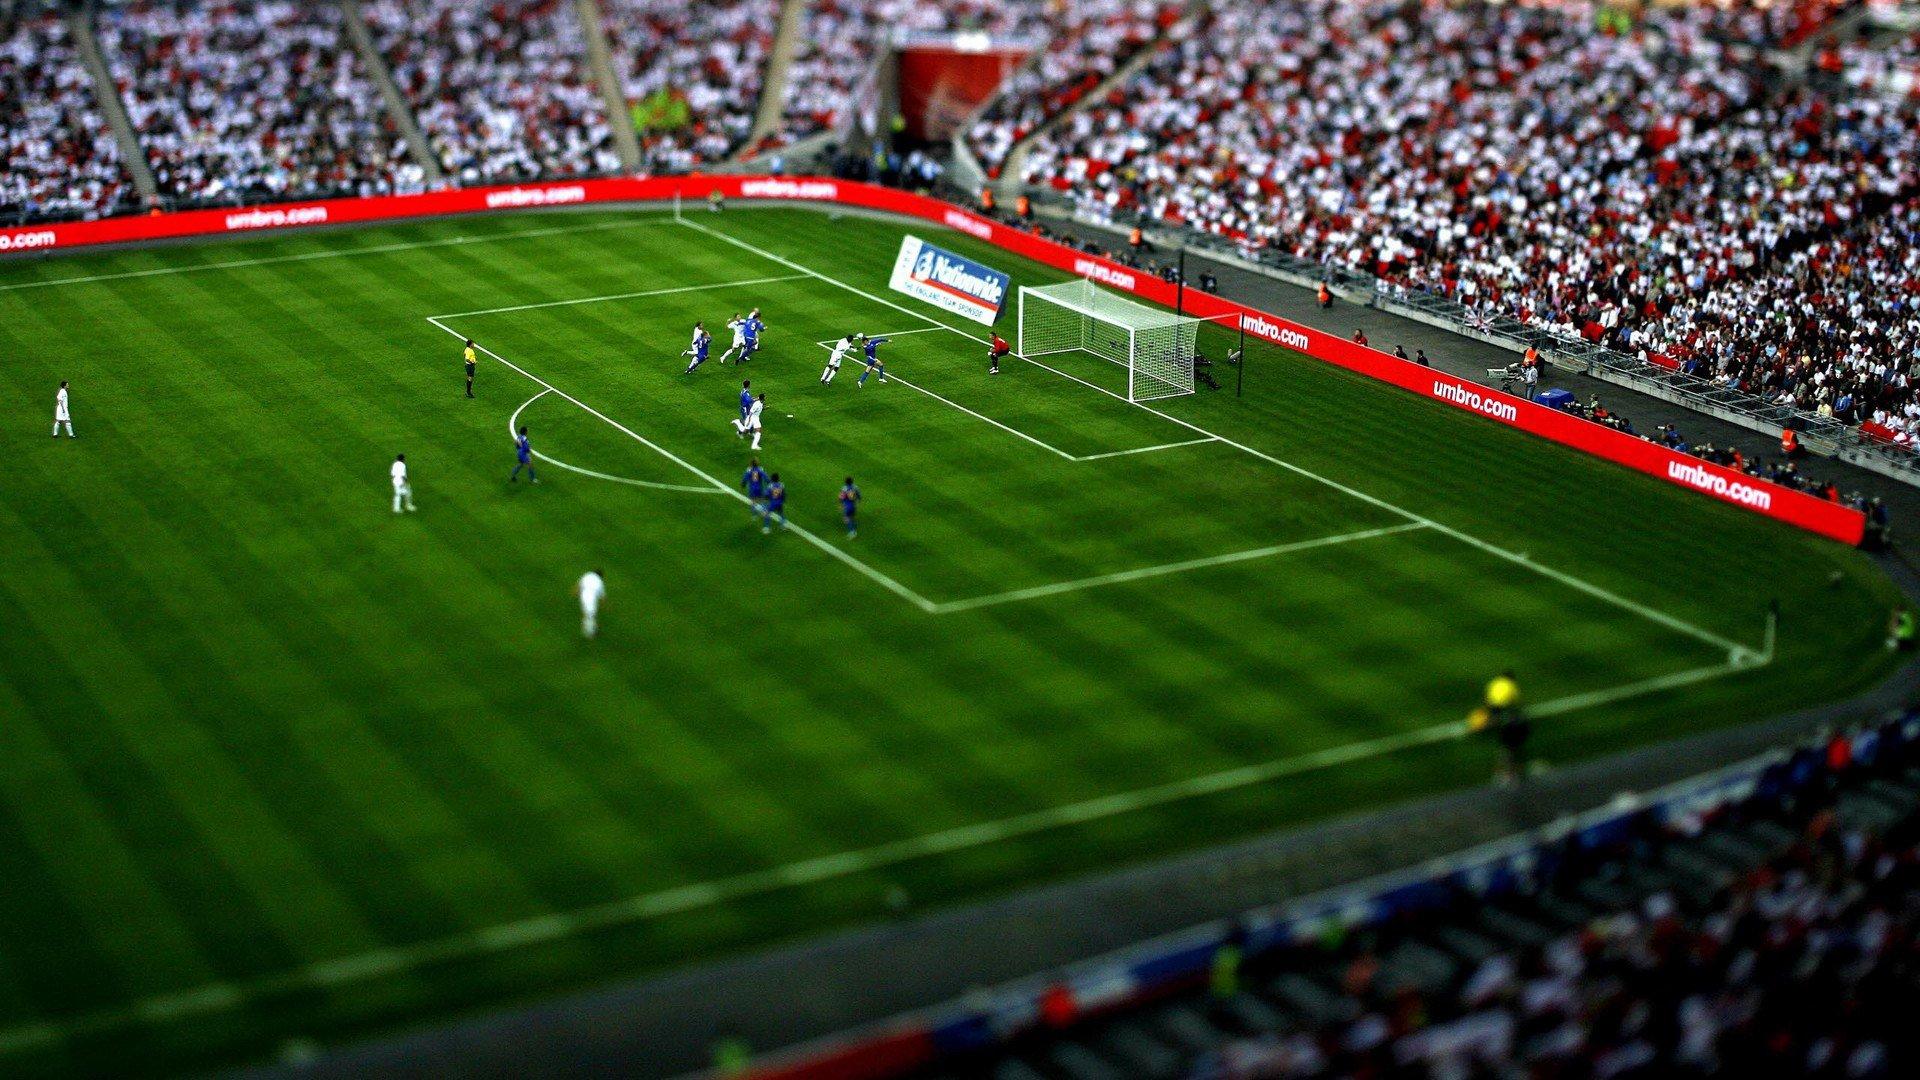 http://3.bp.blogspot.com/-nktfqc9hEh0/UA68TePy0cI/AAAAAAAAKbY/SketHBq2yWM/s1920/football-ground-hd-wallpaper.jpg